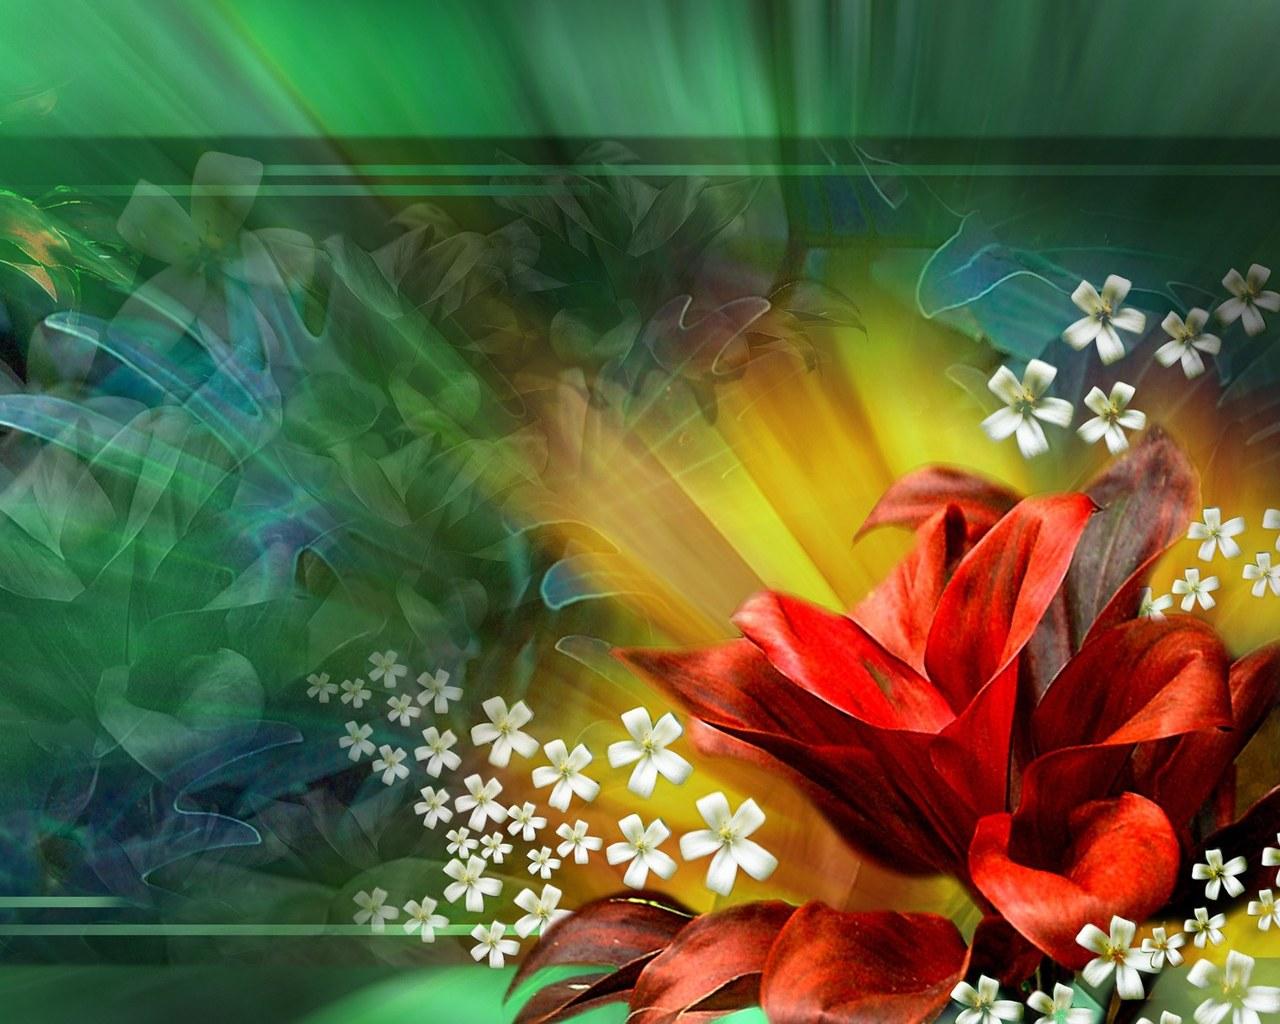 escolar Download Desktop 3D Animated Background Wallpapers 1280x1024